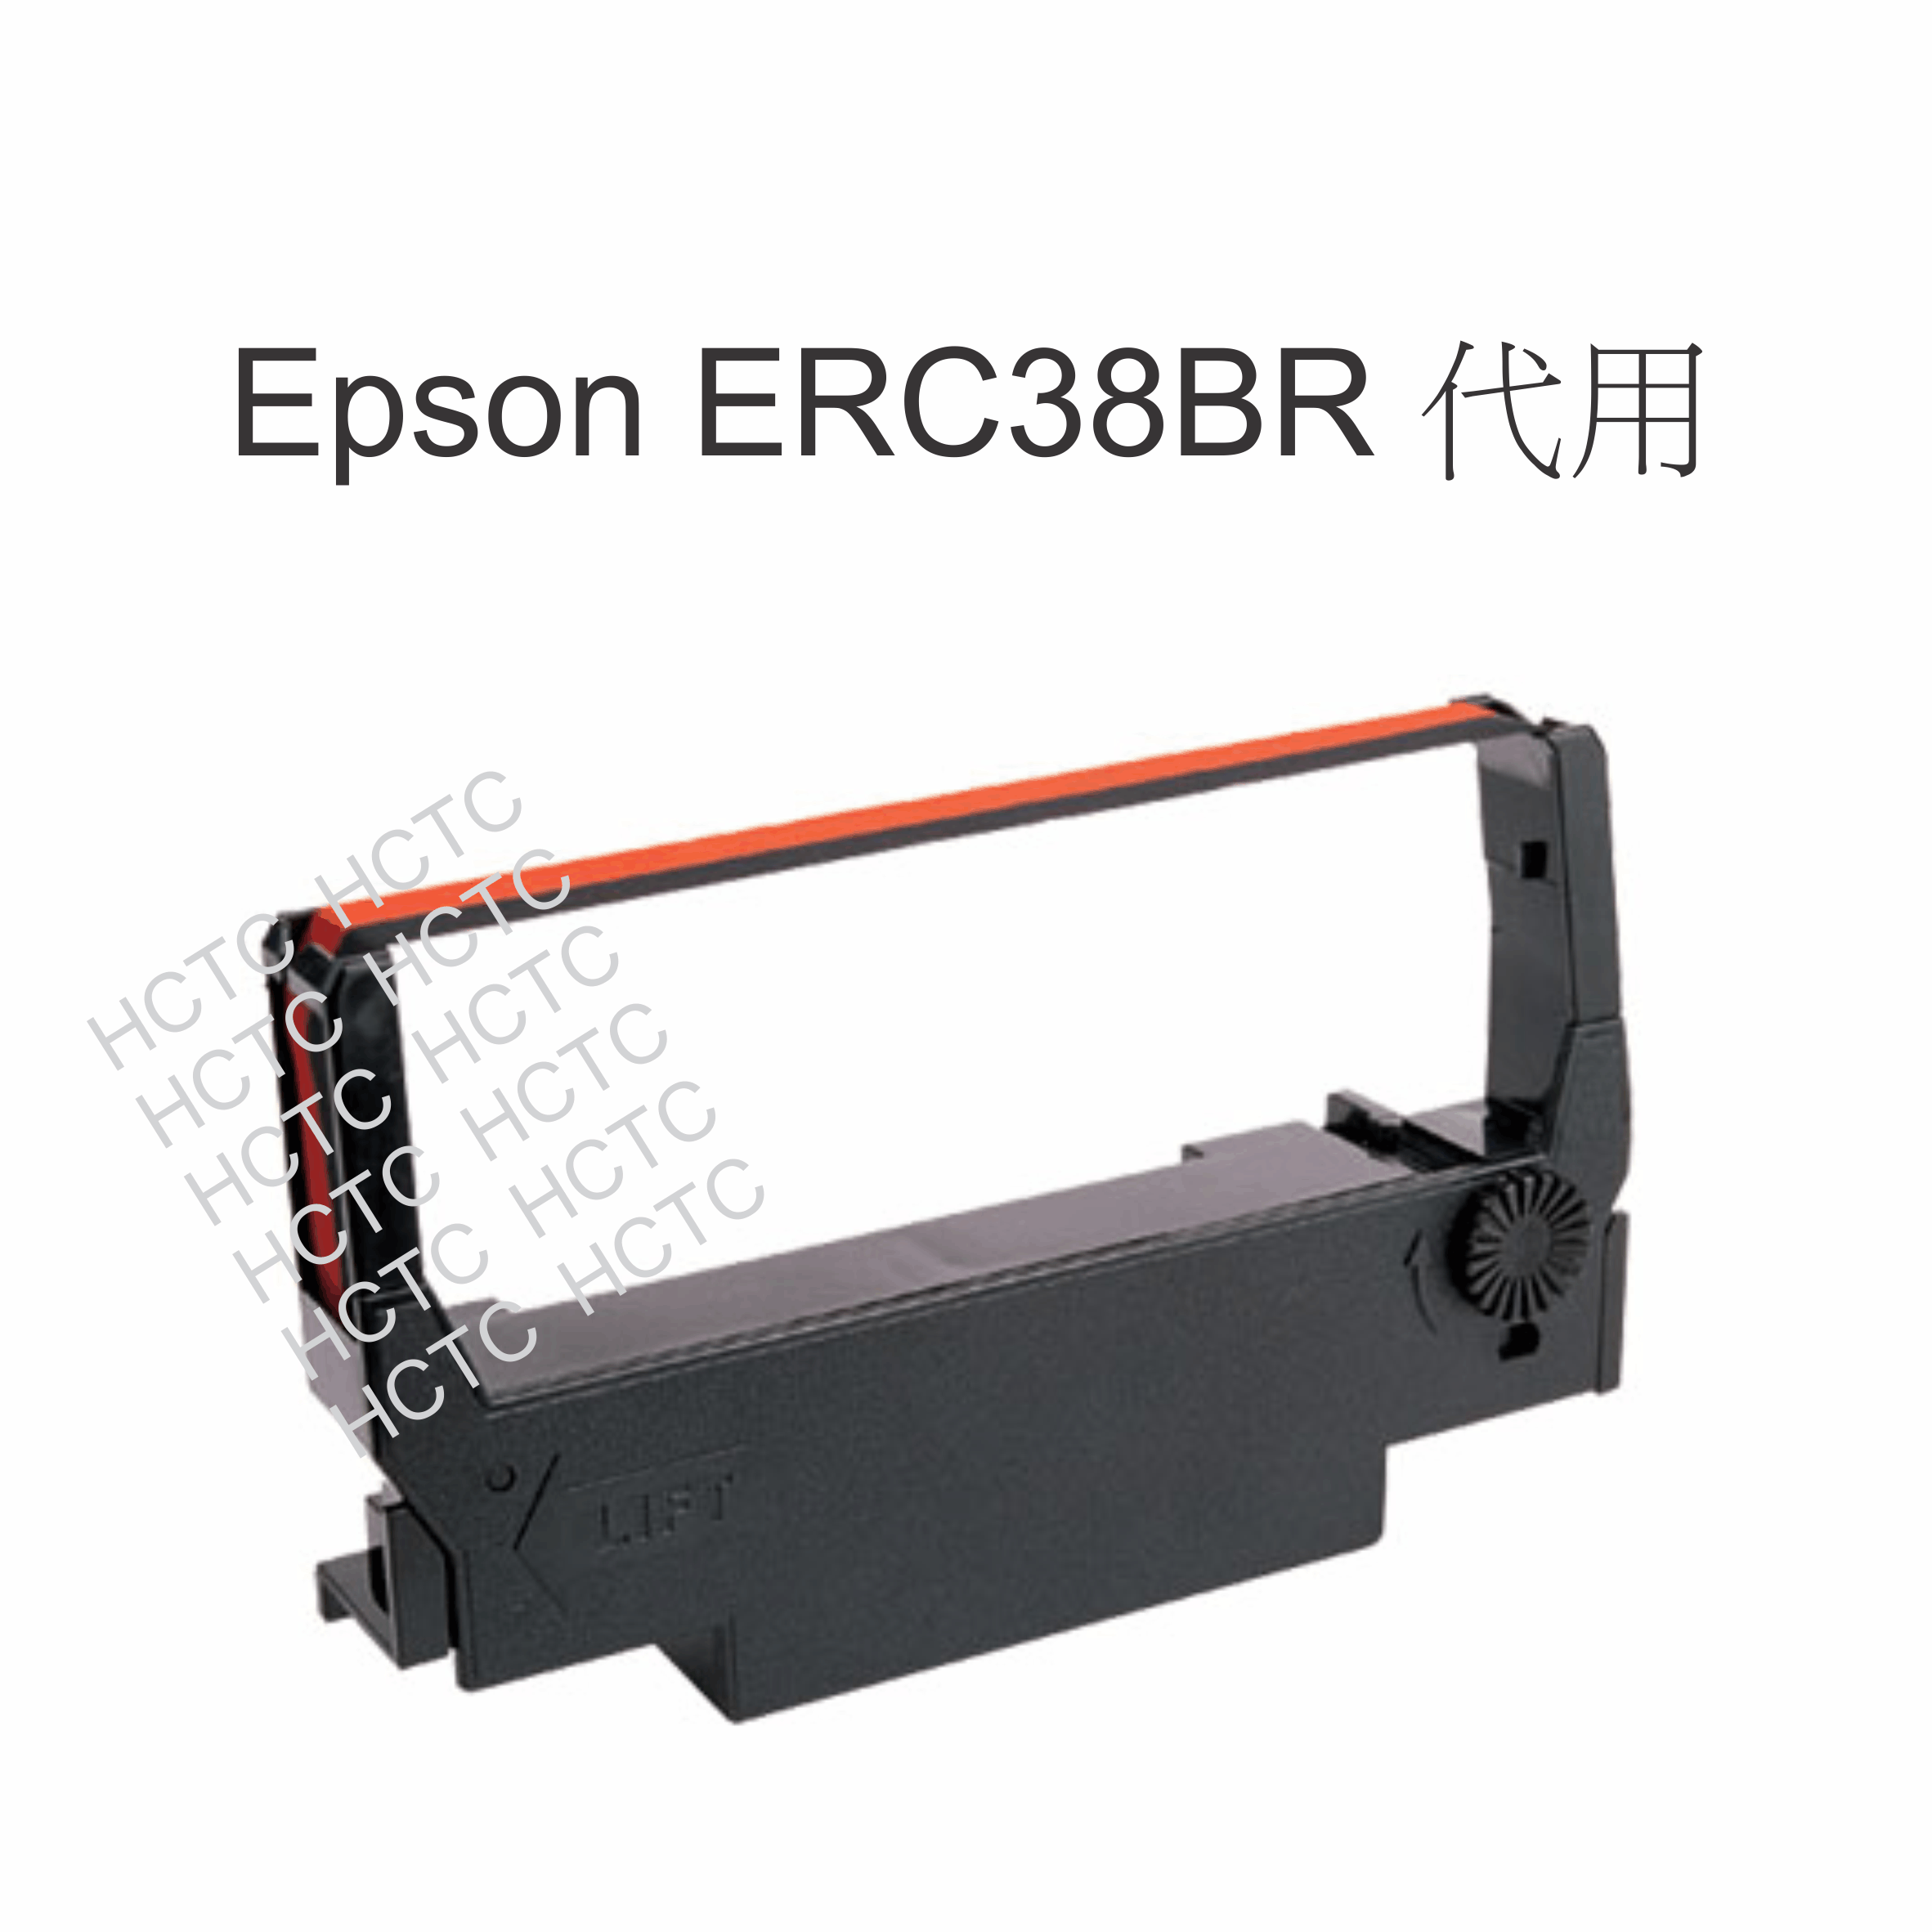 EPSON-COMPATIBEL